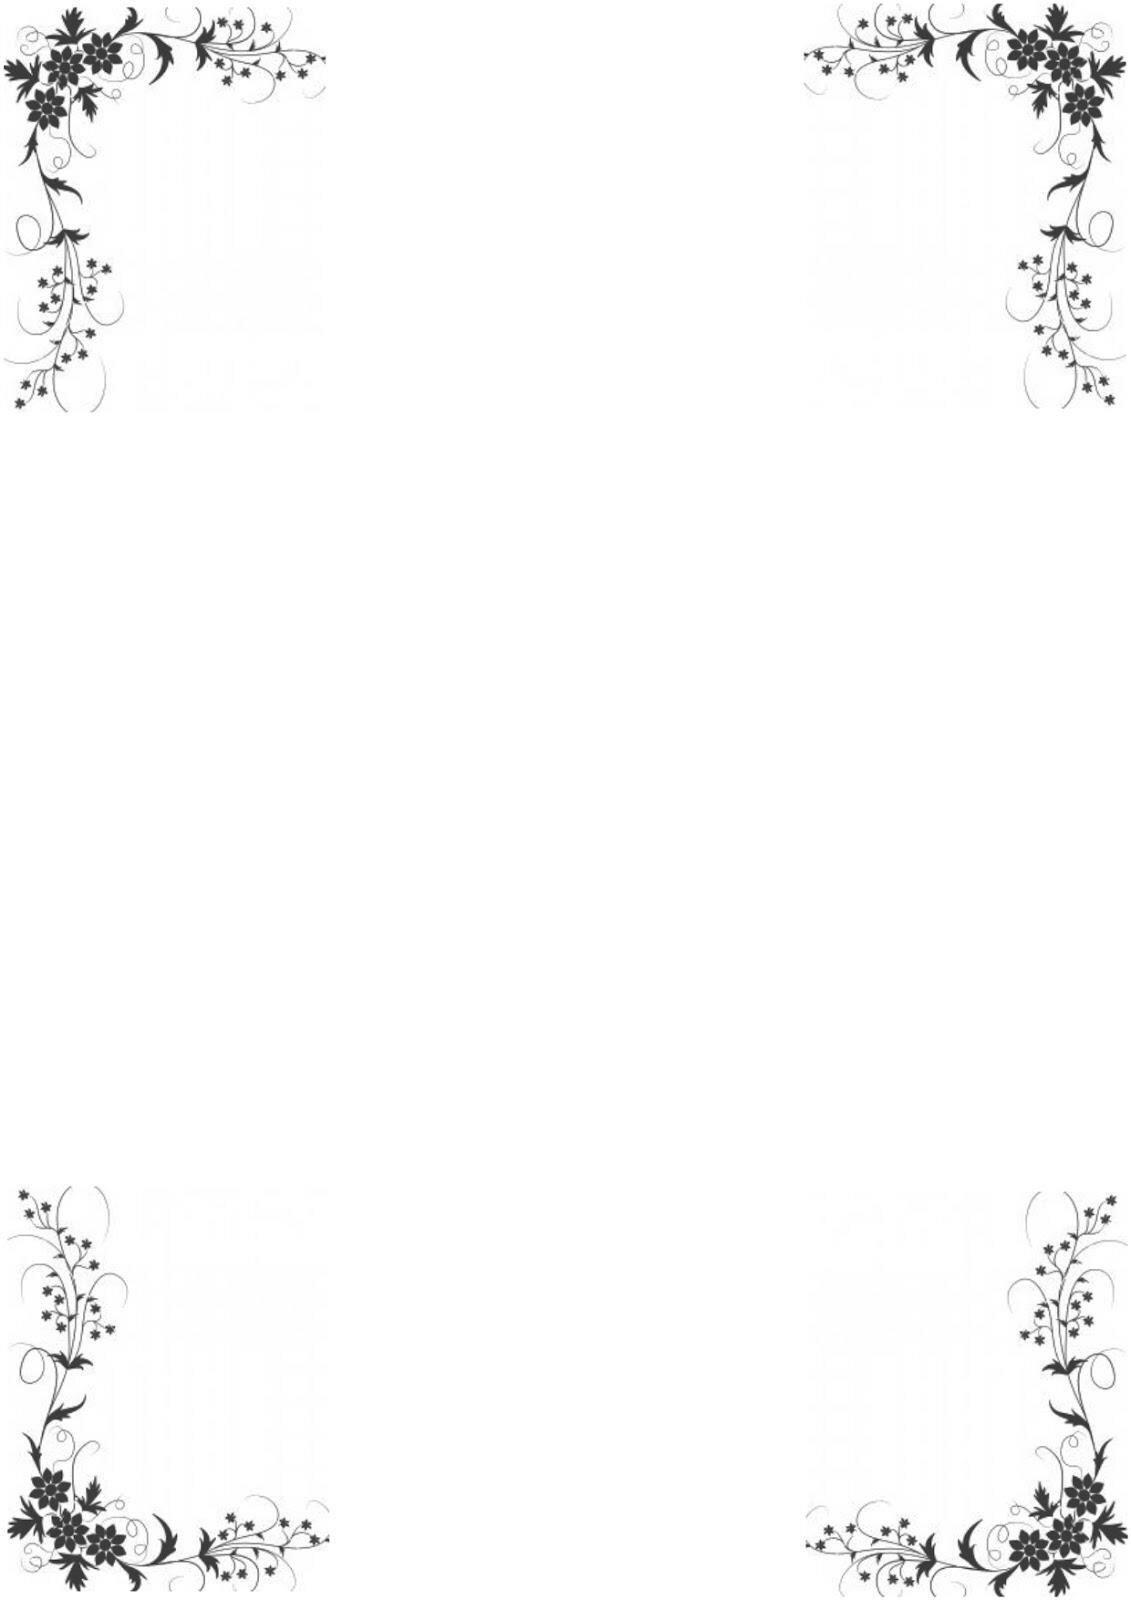 Баланс, рамки для рисунок формат а4